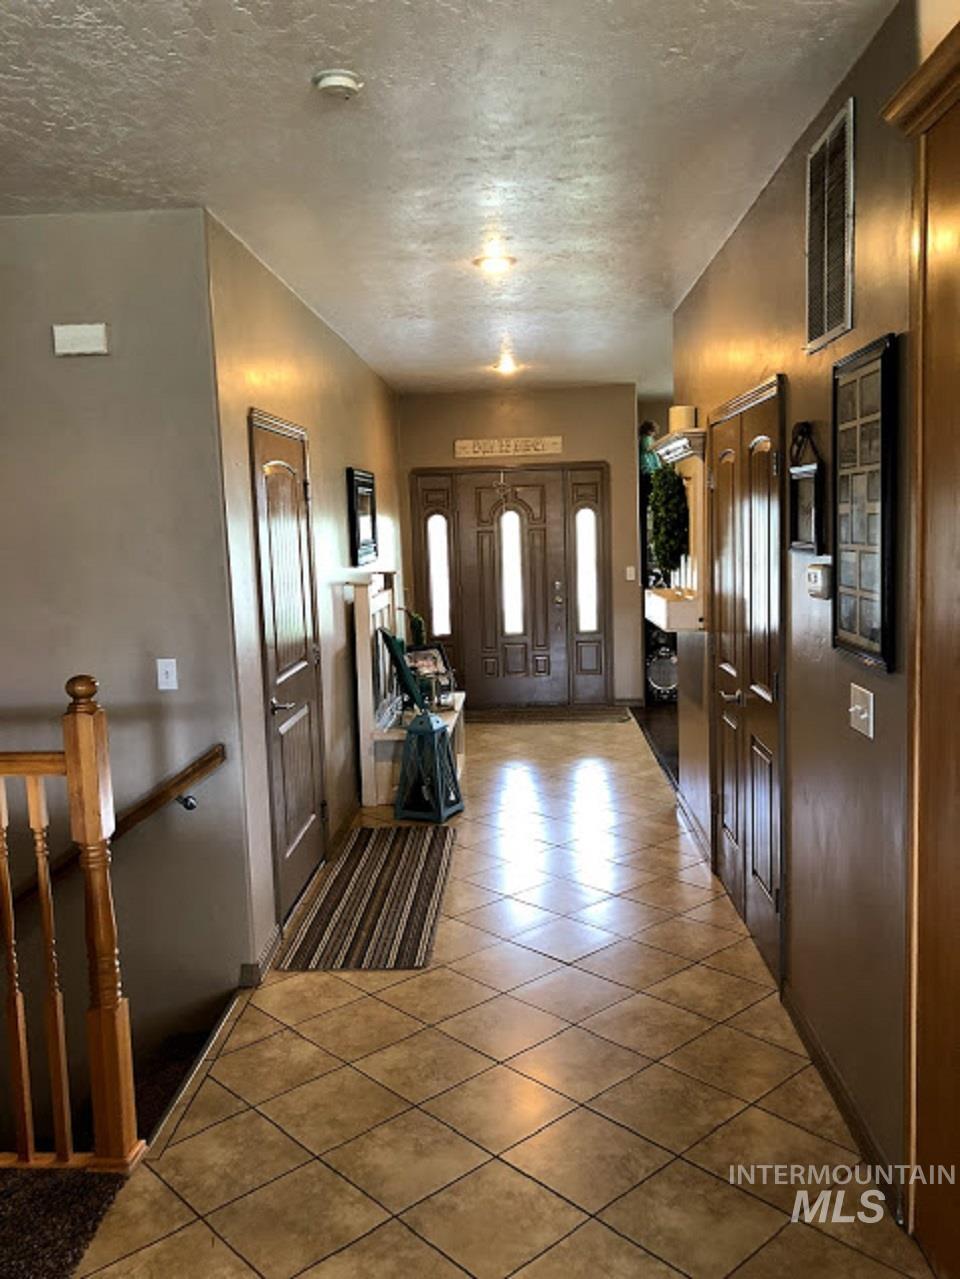 435 S College Property Photo 19